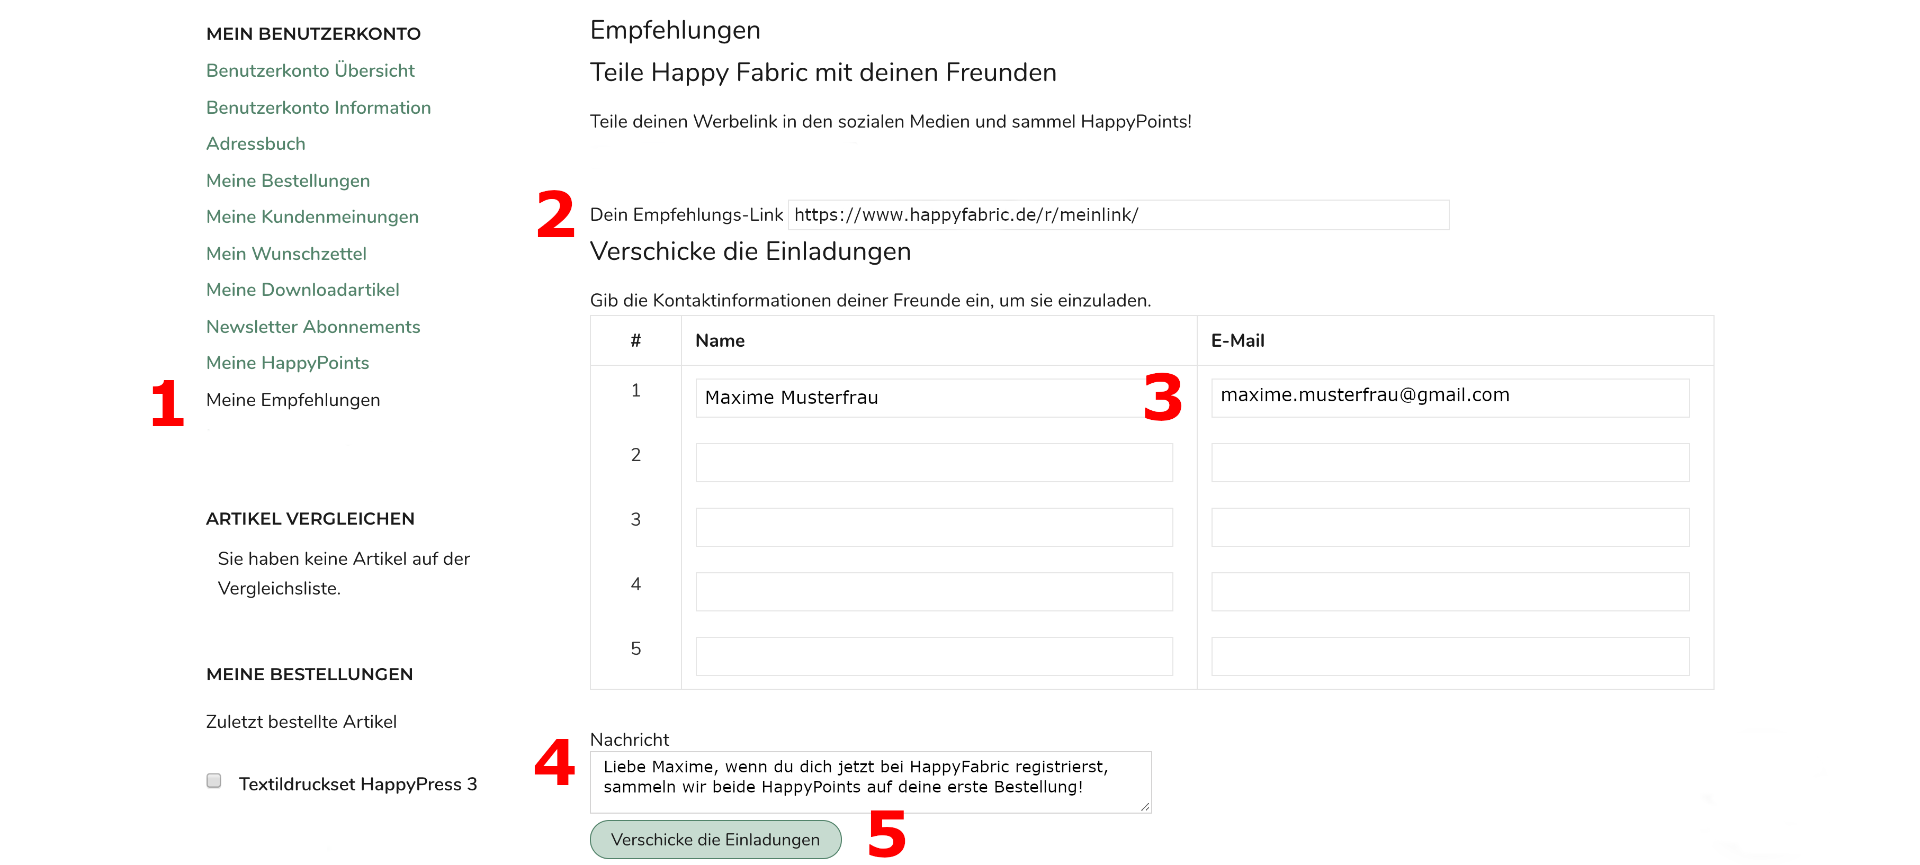 Screenshot of the Refer a Friend process